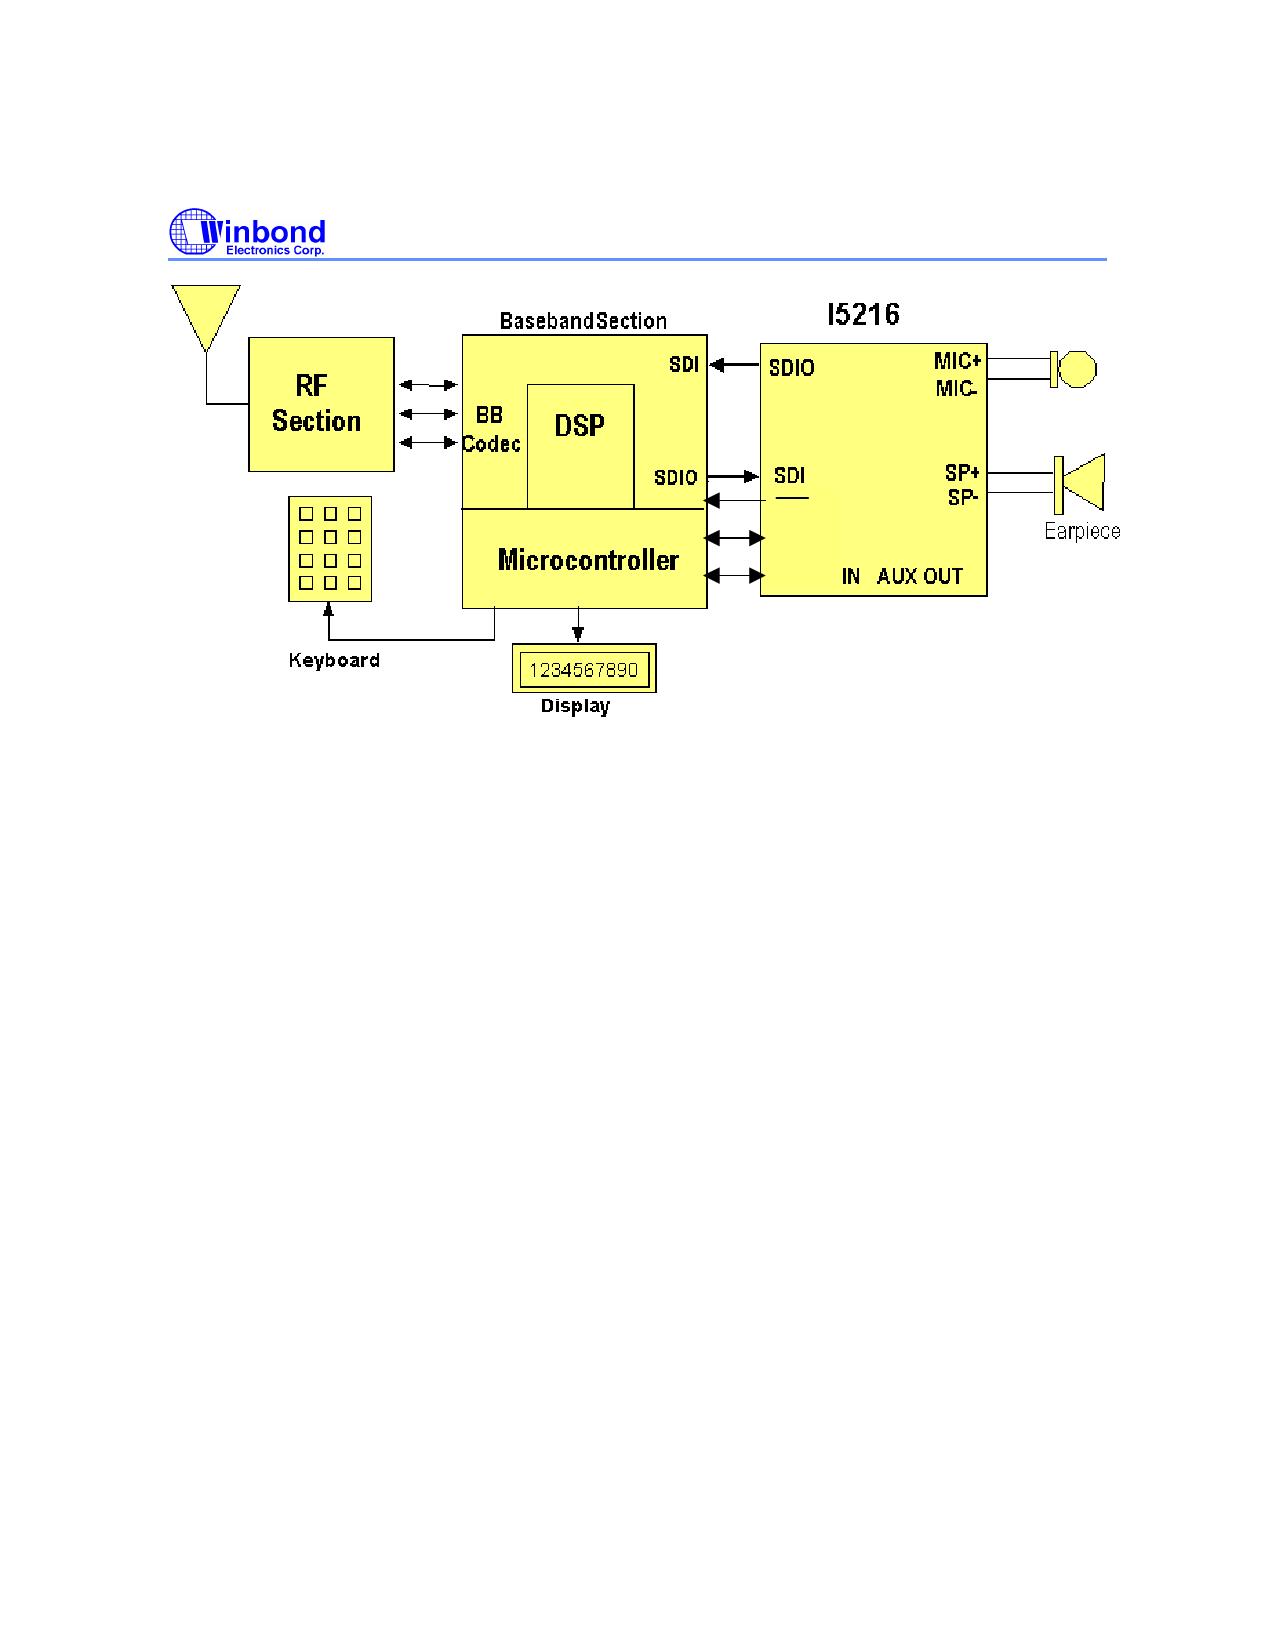 I5216P arduino